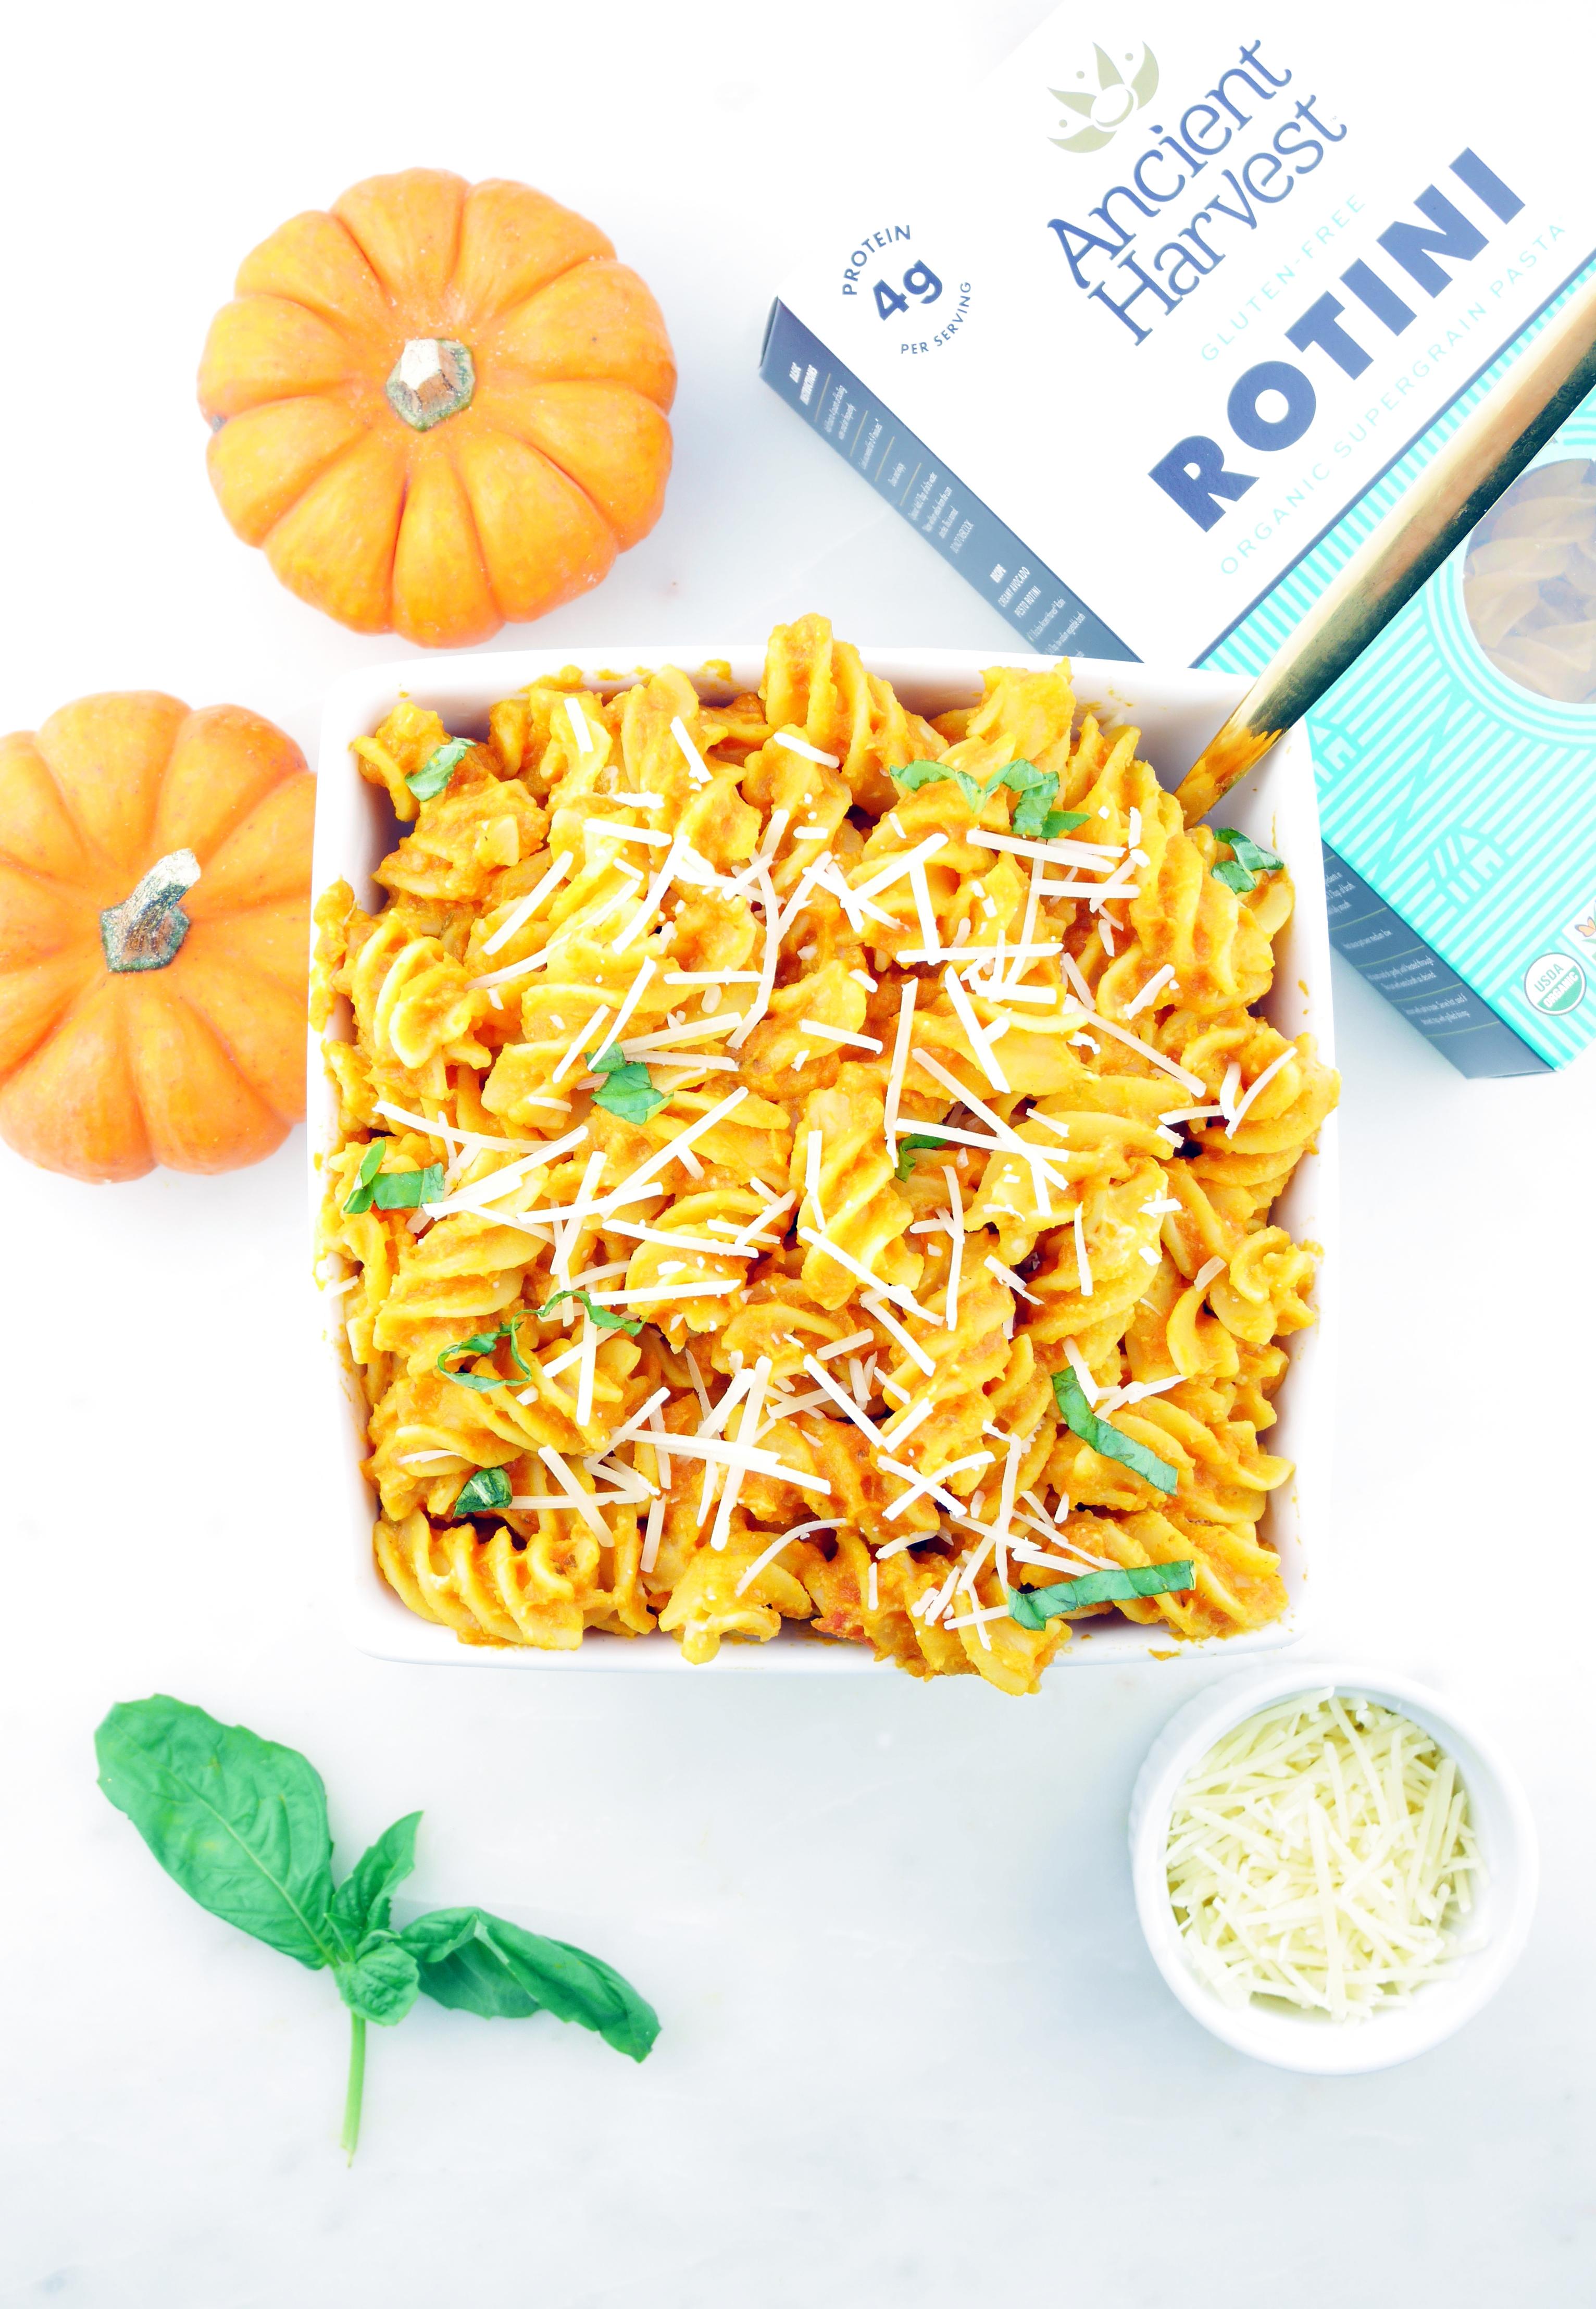 Ancient Harvest Organic Gluten Free Supergrain Pasta